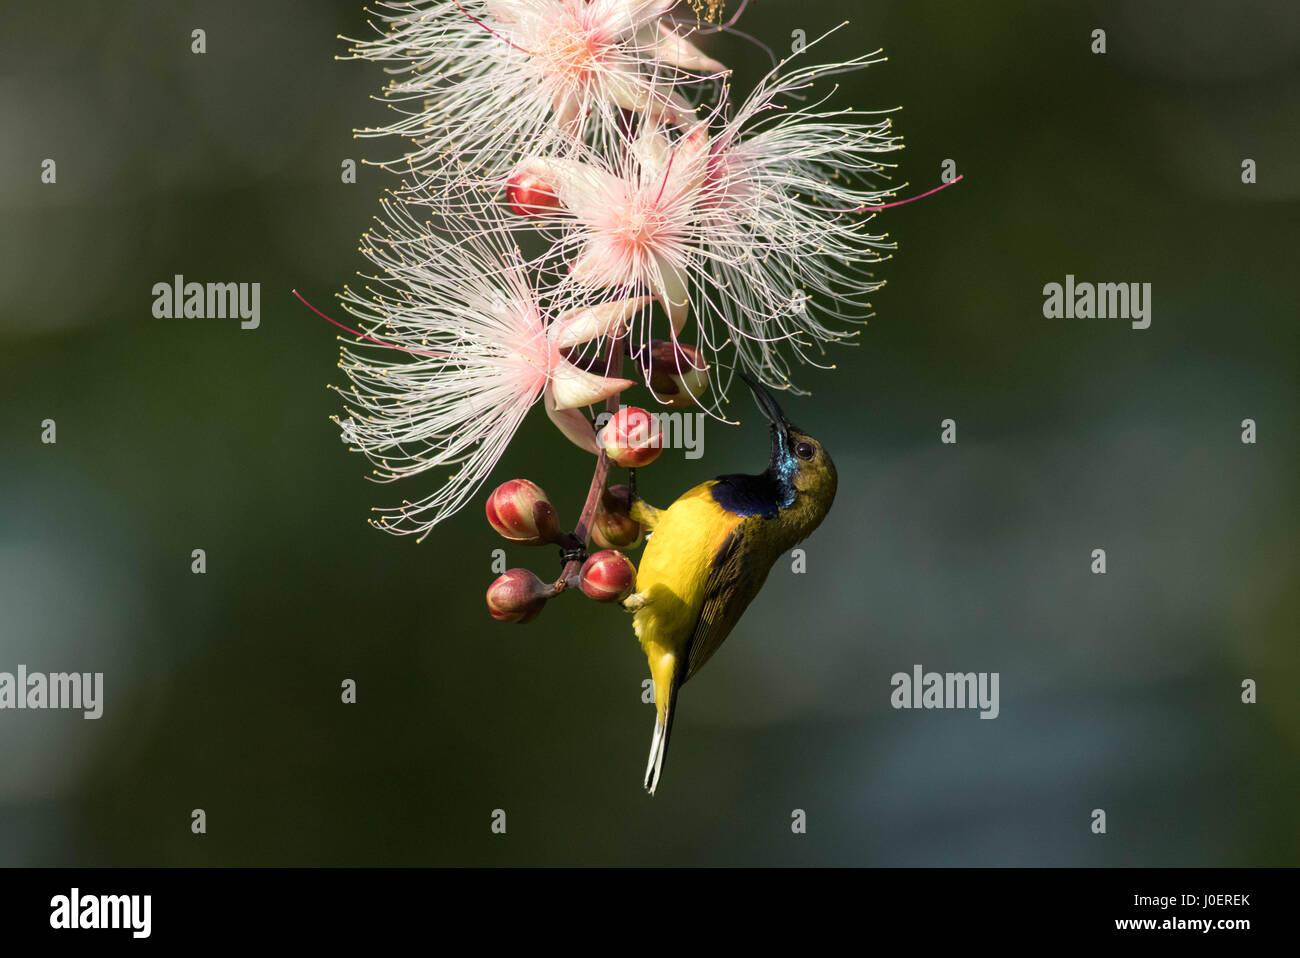 Olive-backed Sunbird feeding on nectar in the gardens of Khoo Teck Phuat Hospital, Singapore. - Stock Image